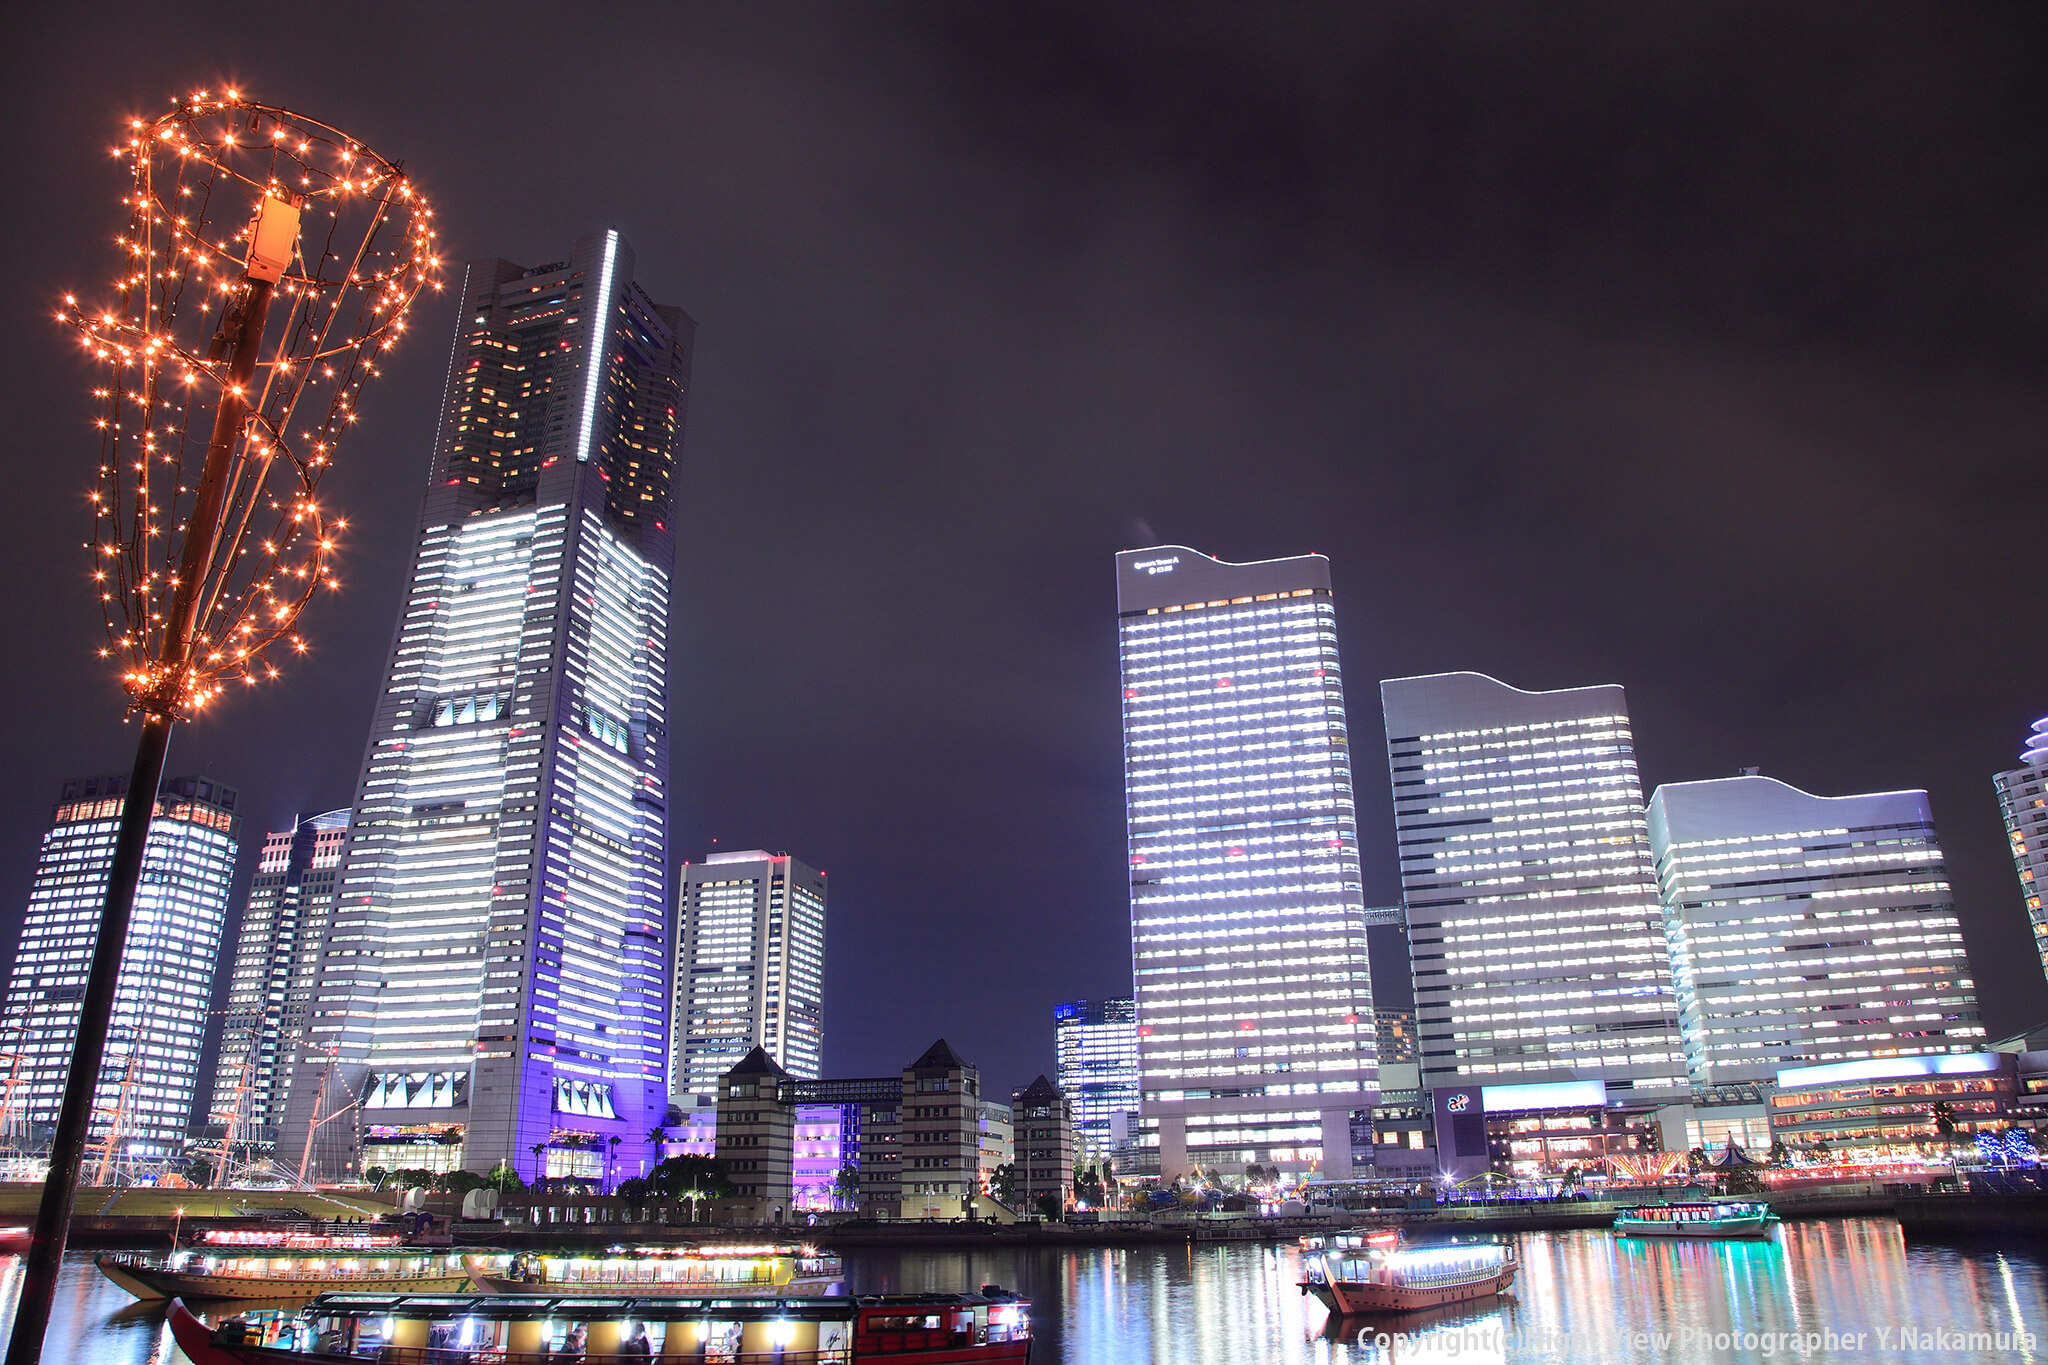 Photo of 横浜みなとみらい地区が最も輝く日!「全館点灯ライトアップ」オススメ鑑賞スポット3選